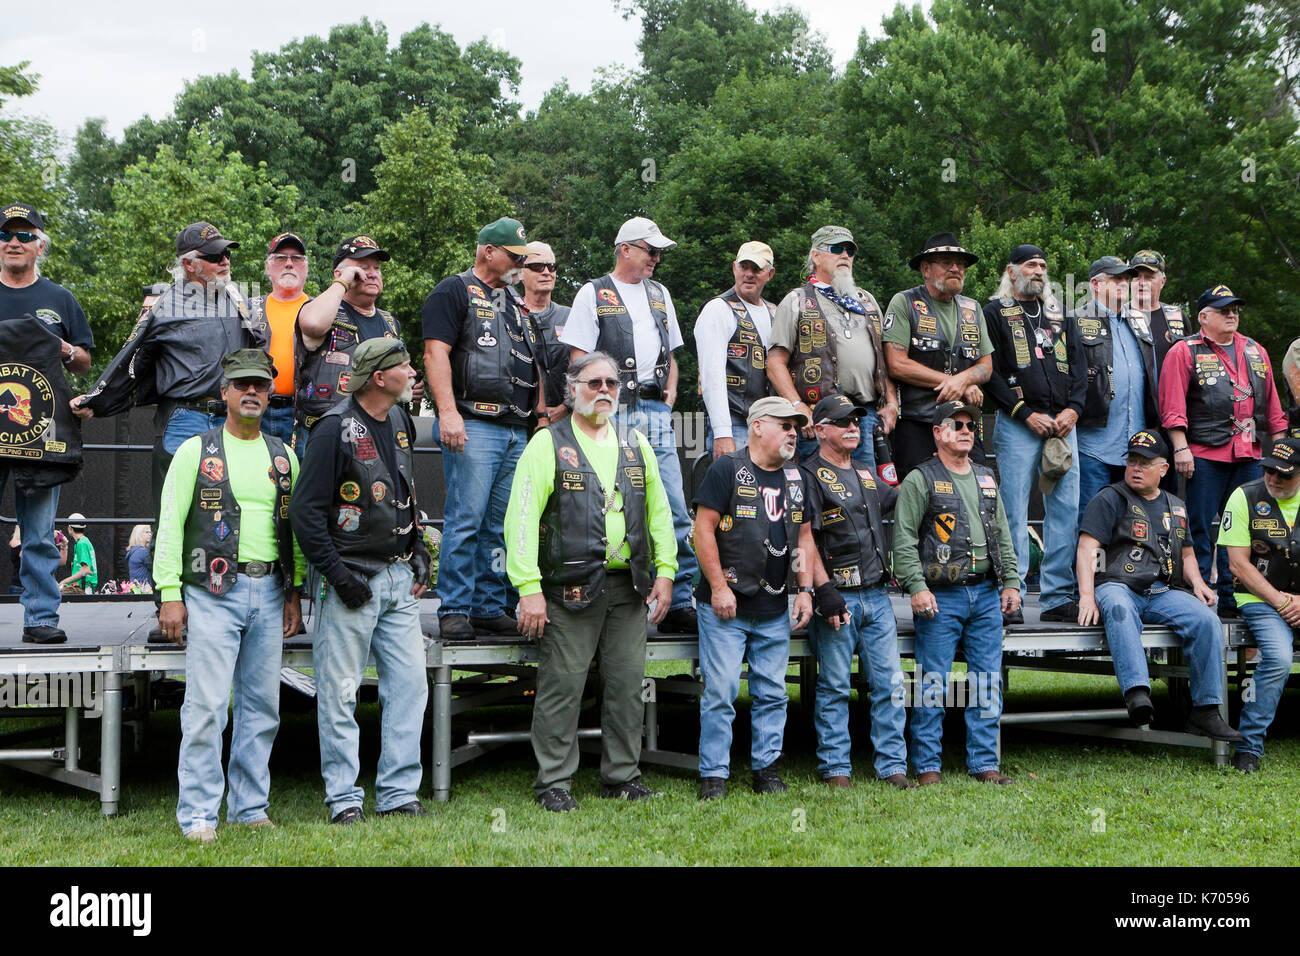 Members of Combat Veterans Motorcycle Association at Vietnam War Memorial during Memorial Day weekend - Washington, DC USA - Stock Image